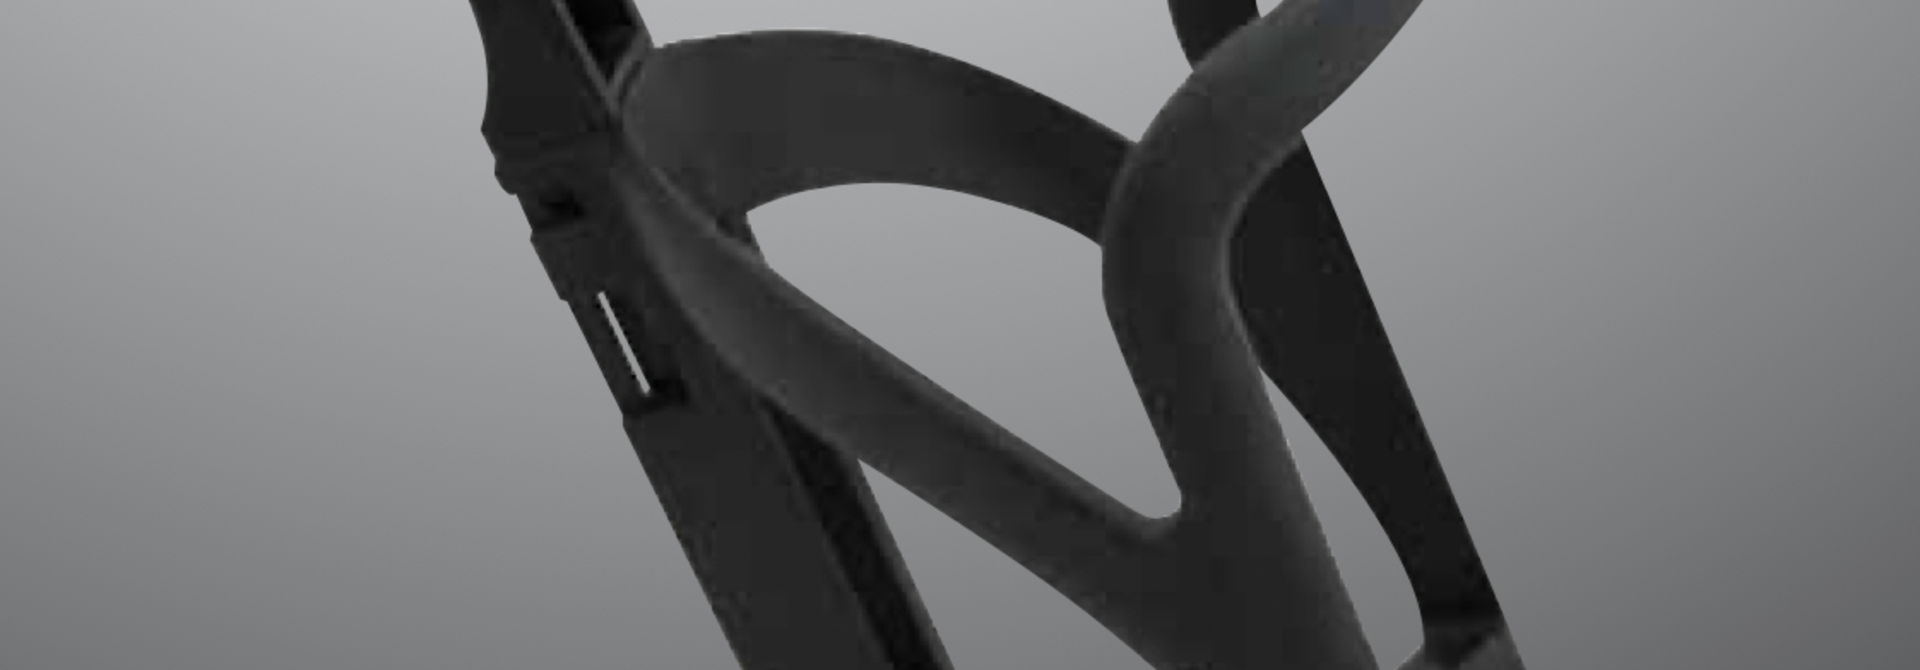 Porte bidon composite comp